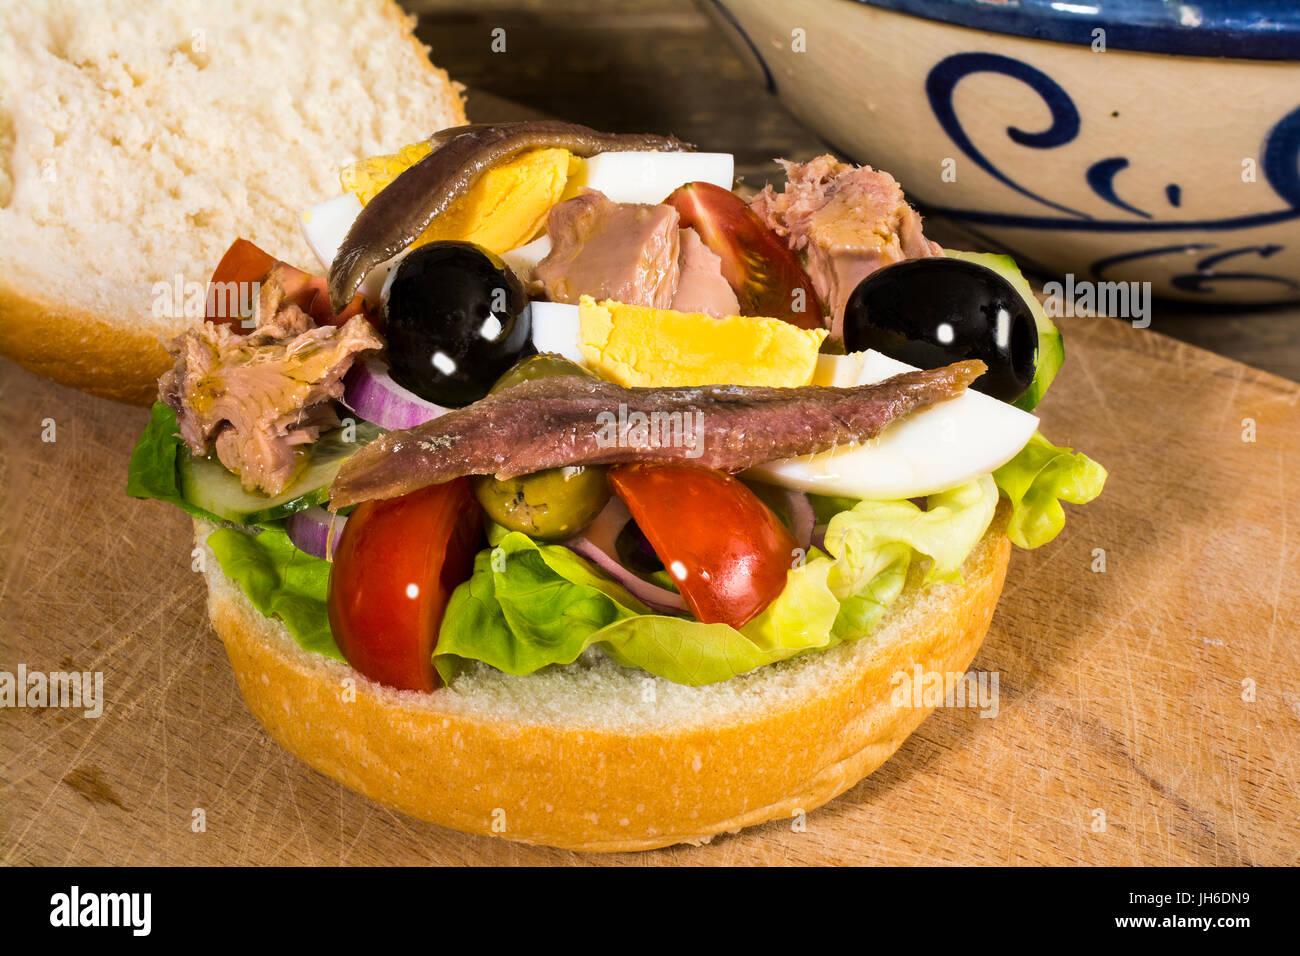 Echte Pan Bagnat, traditionelle Salat Sandwich aus Nizza Cote d'Azur, Frankreich: Kopfsalat, Tomaten, Zwiebeln, Stockbild